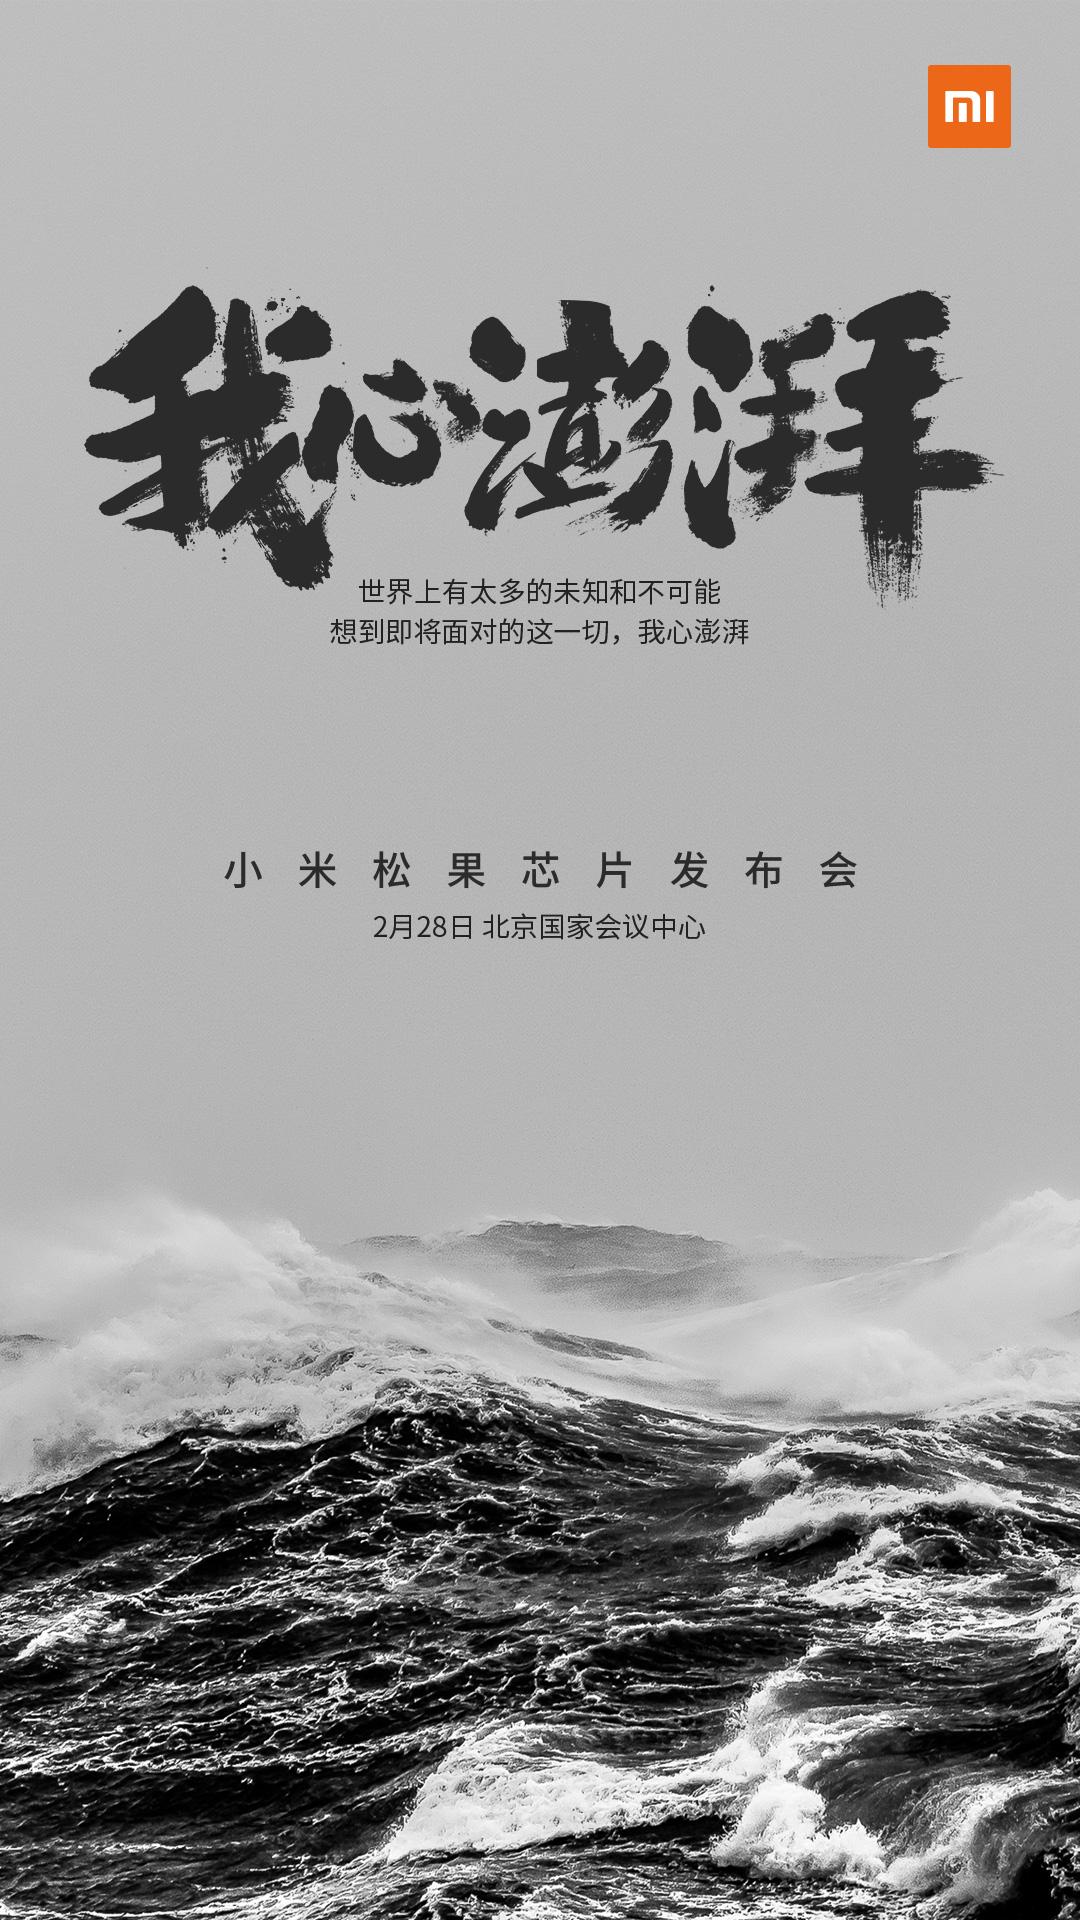 SoC Xiaomi Pinecone